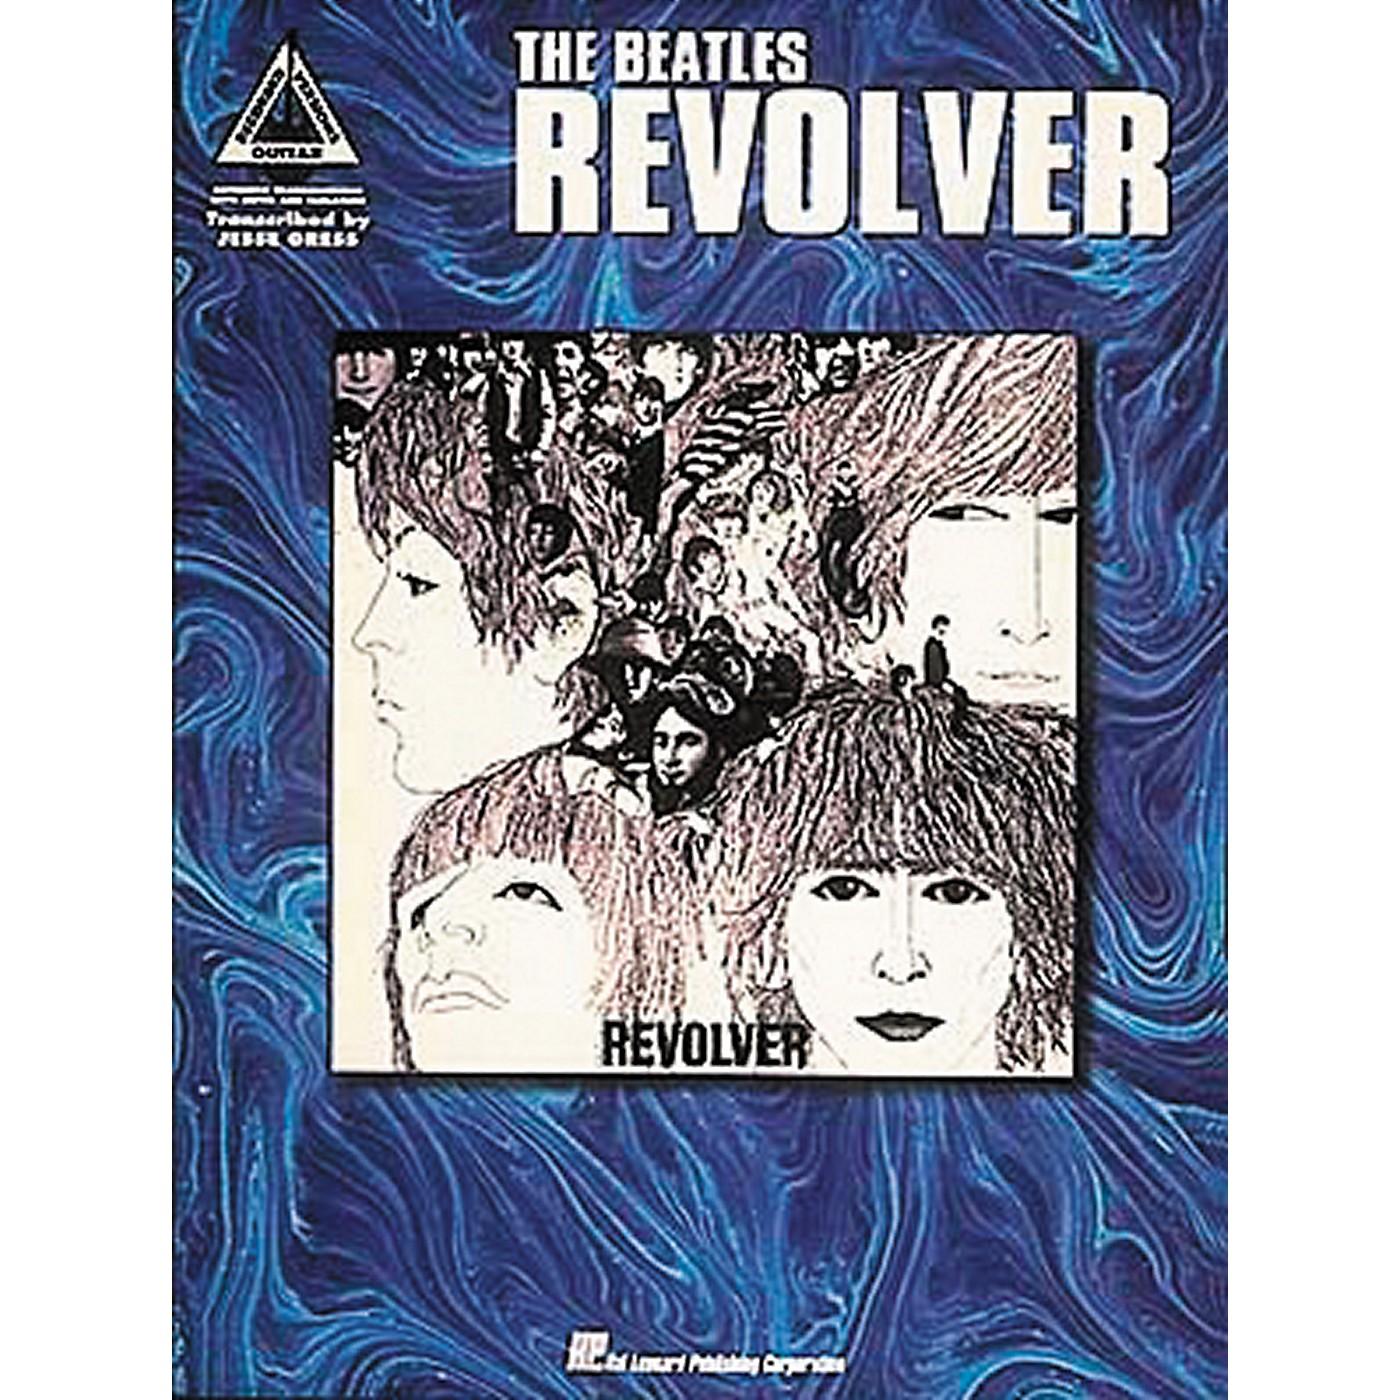 Hal Leonard The Beatles Revolver Guitar Tab Book thumbnail